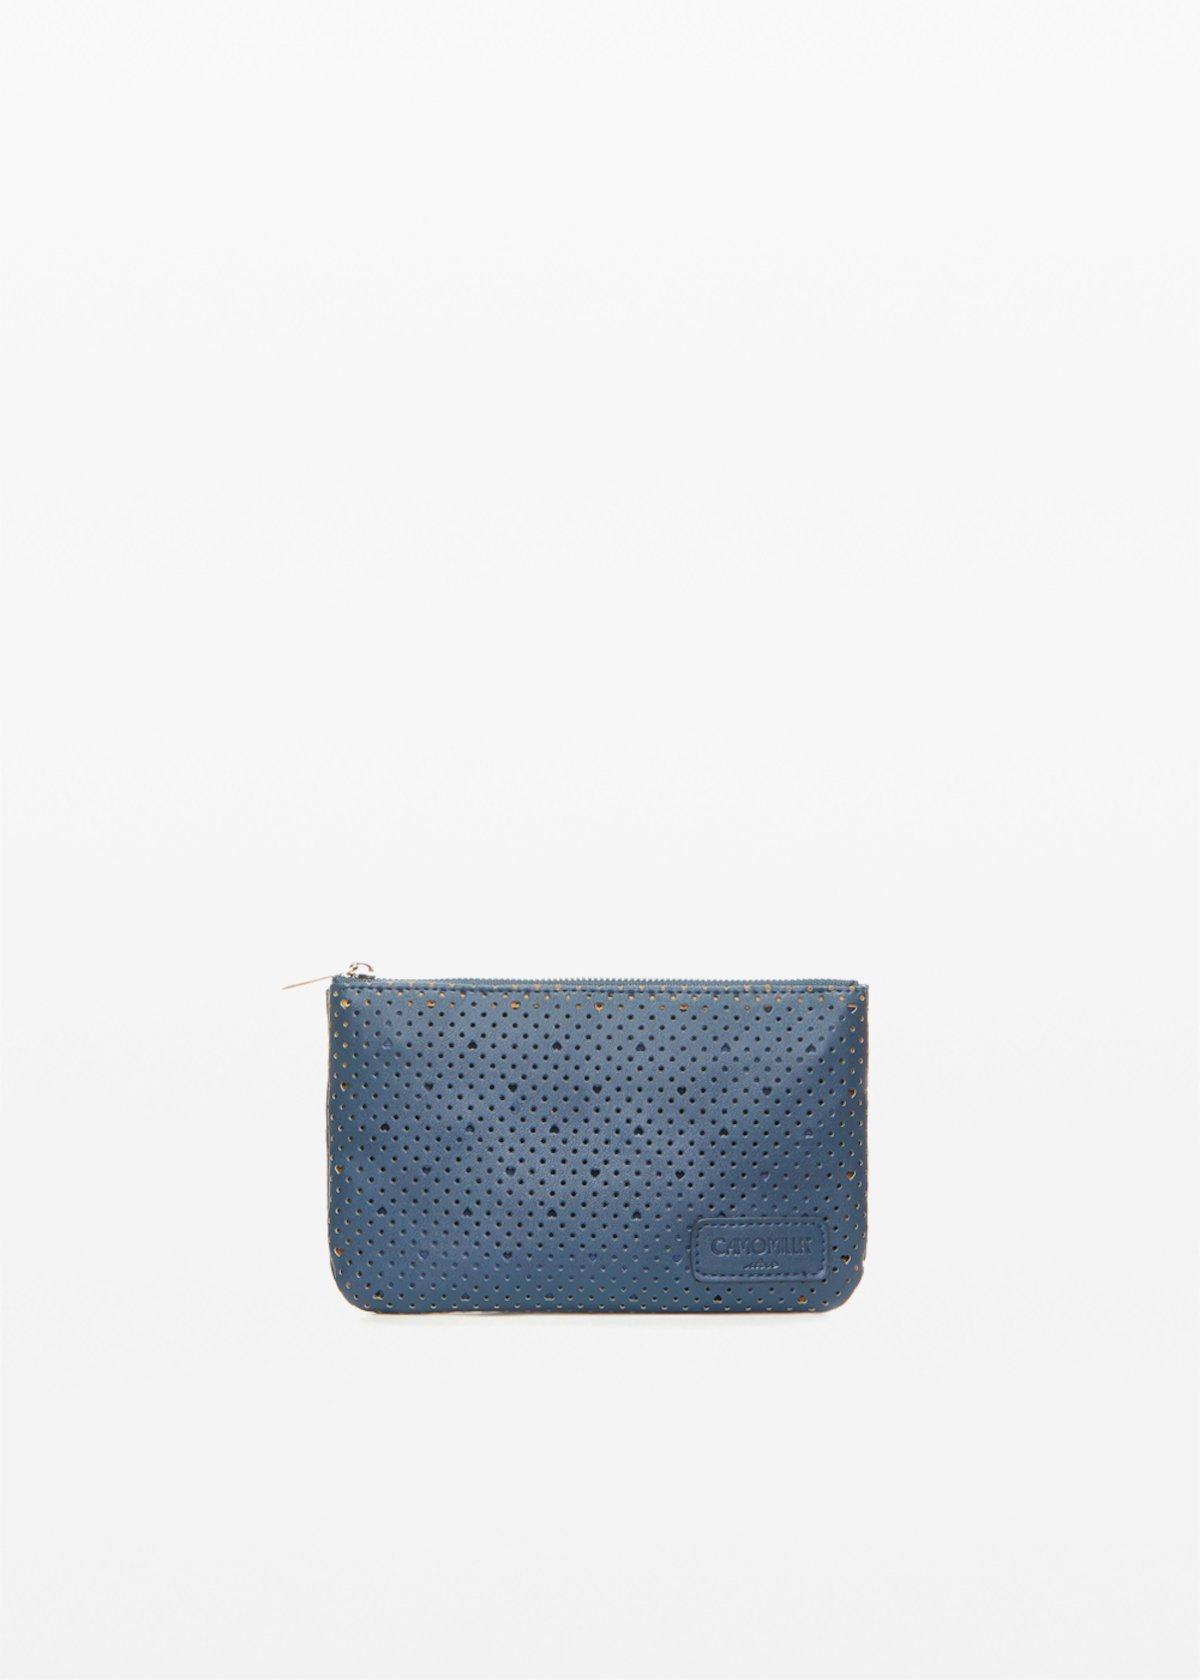 Tongheape Tonga bag with perforated hearts - Medium Blue - Woman